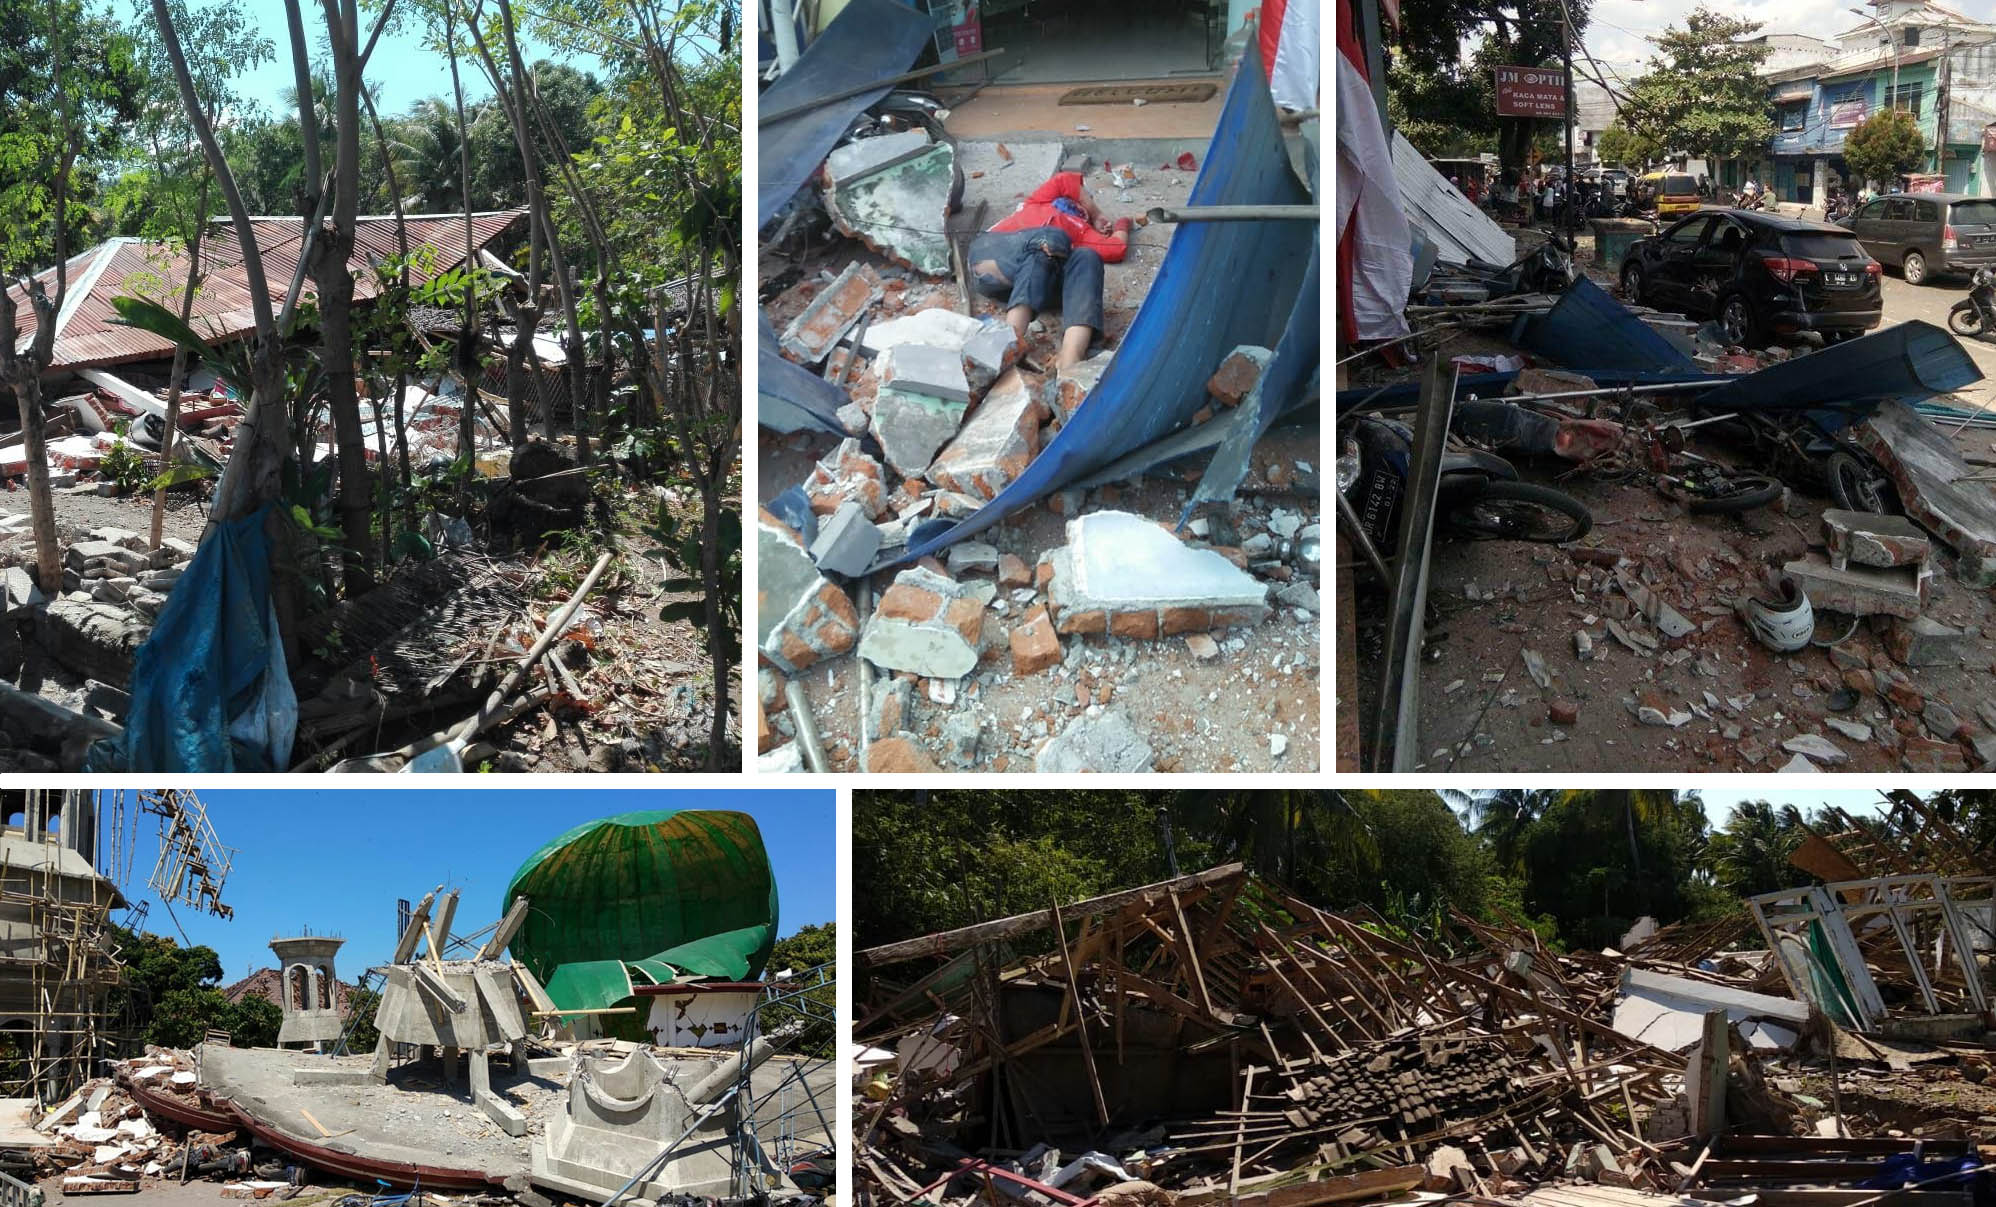 Desa, dusun, sampai kota Mataram terkena dampak gempa berkekuatan 7.0 SR. -  Dok MRI/ACT